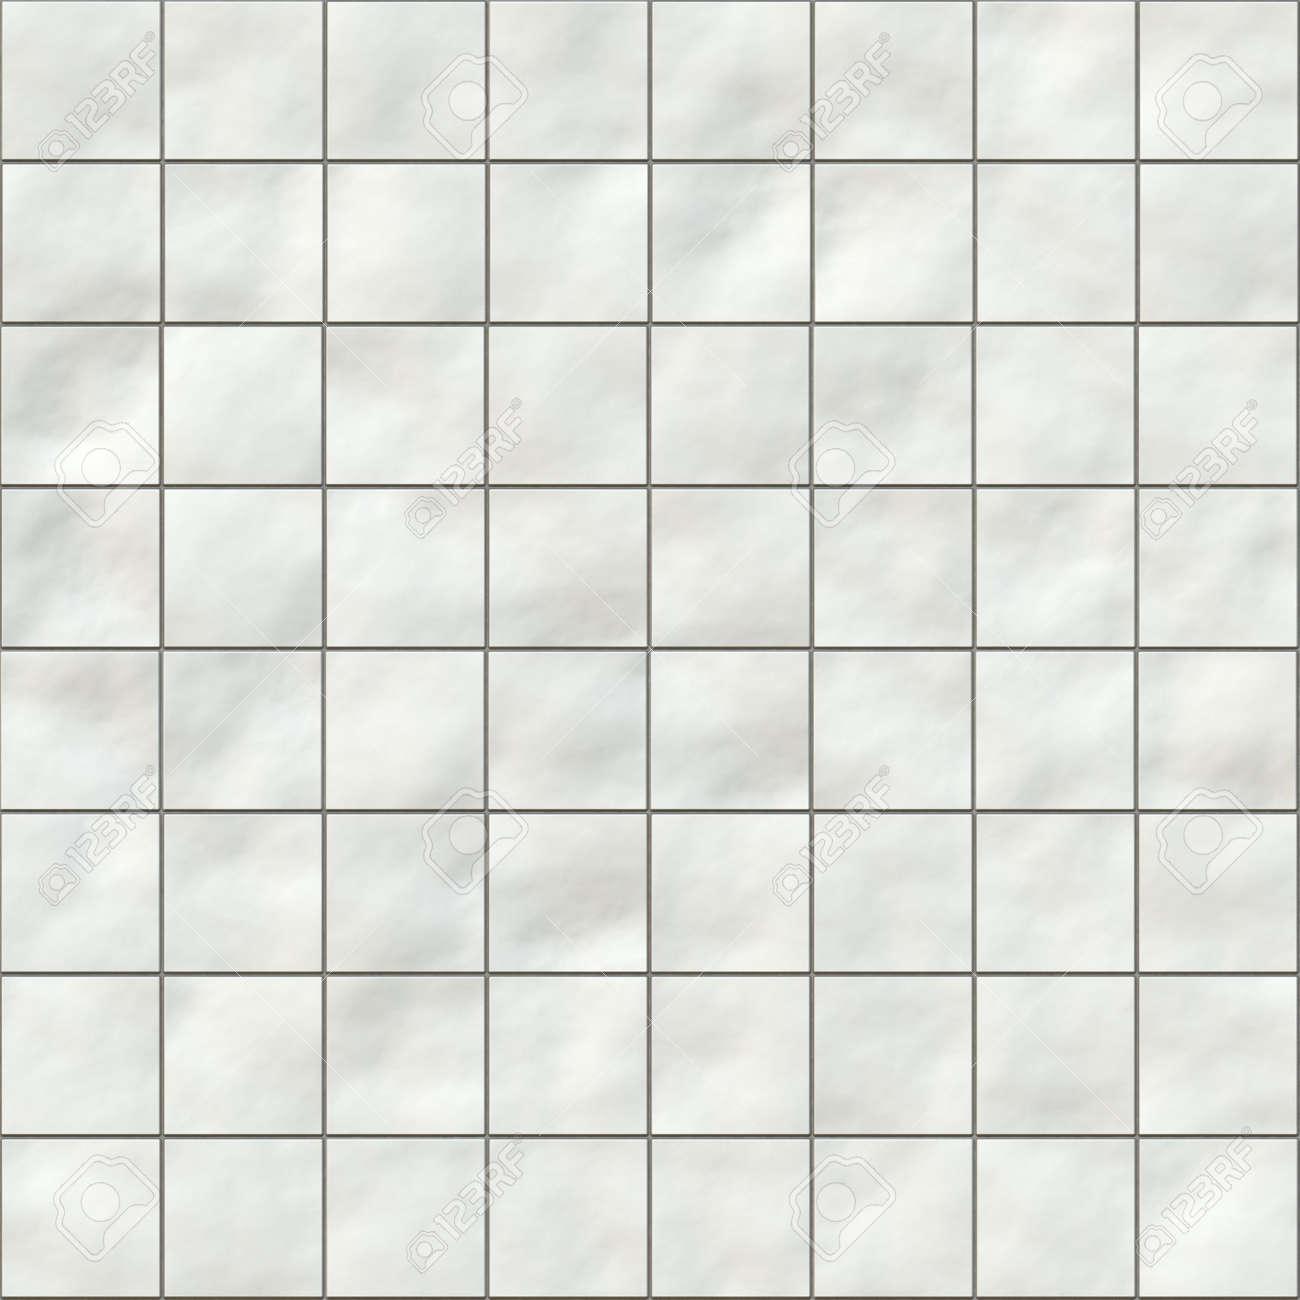 White Ceramic Tiles For Kitchen Or Bathroom, Seamlessly Tillable ...